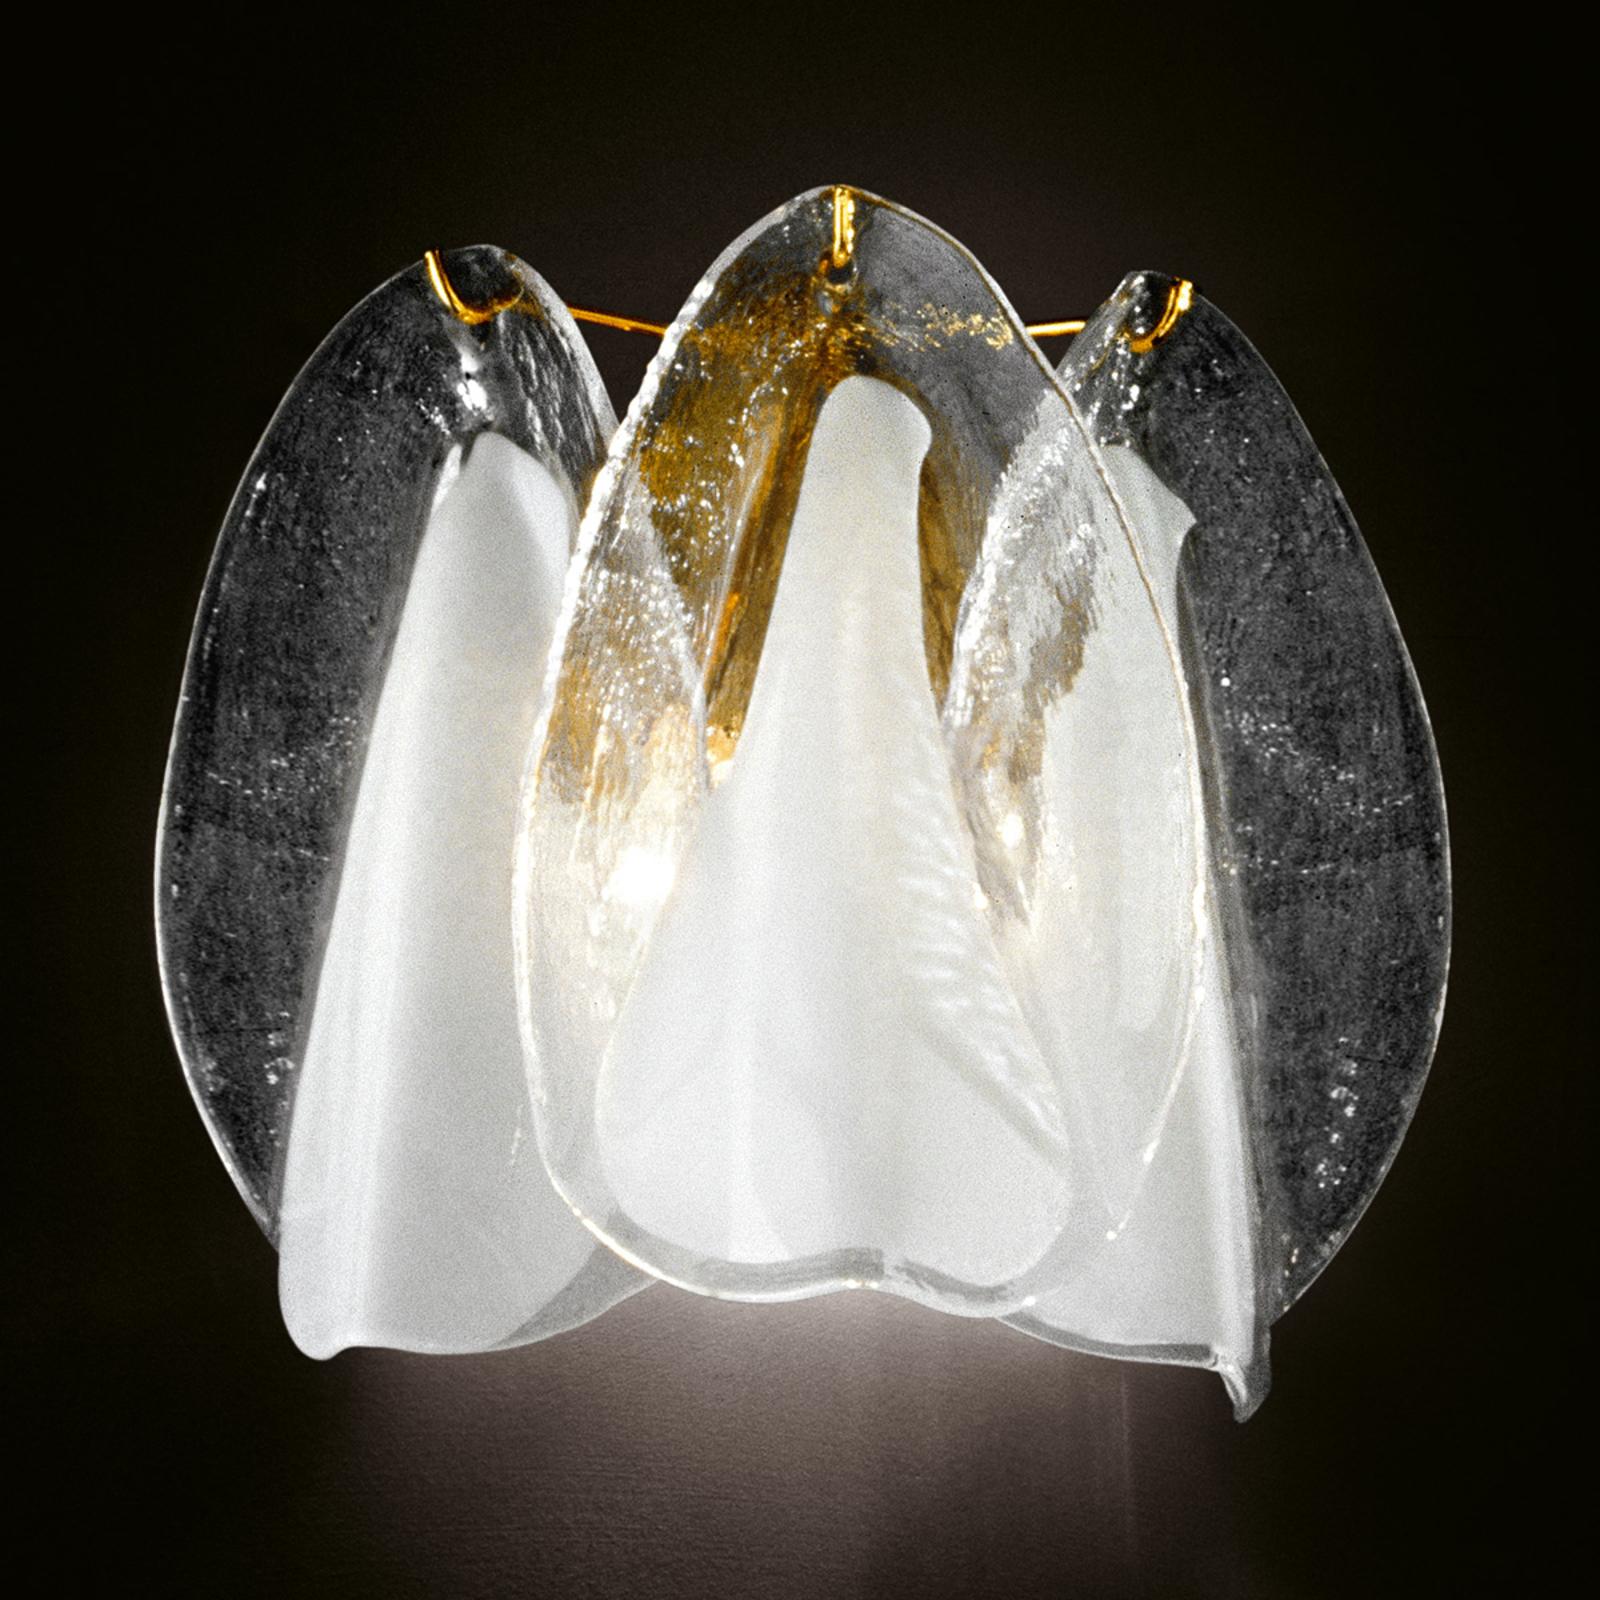 Applique en verre Rondini avec de l'or 24 carats